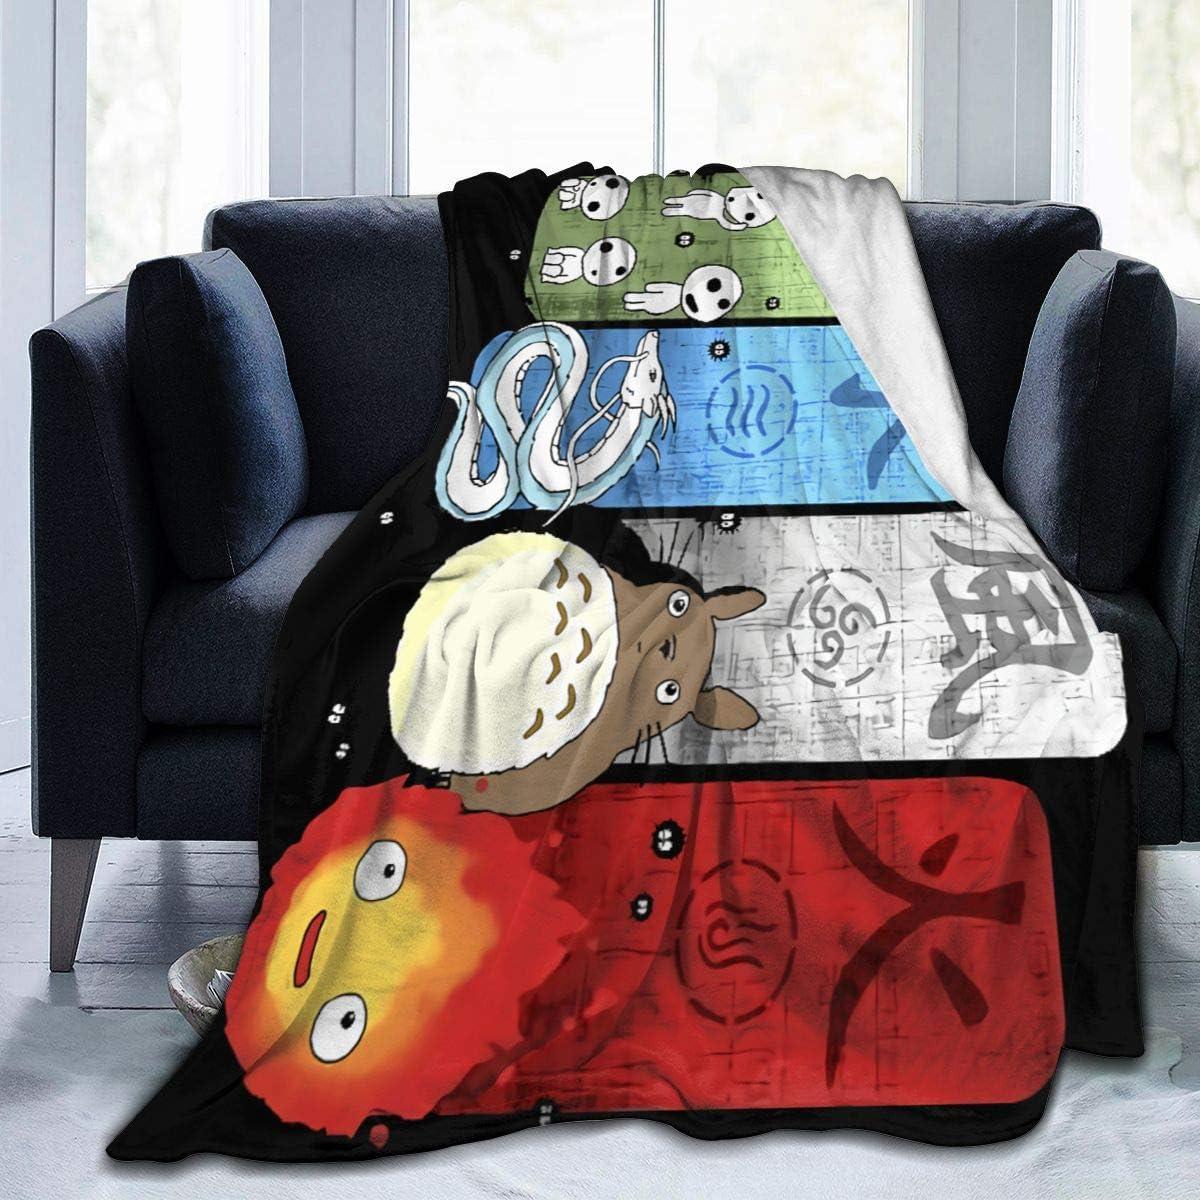 LMHBLTOP Ghibli SALE開催中 Elemental Charms Blanket 格安SALEスタート Ultra-Soft Fleece Flann